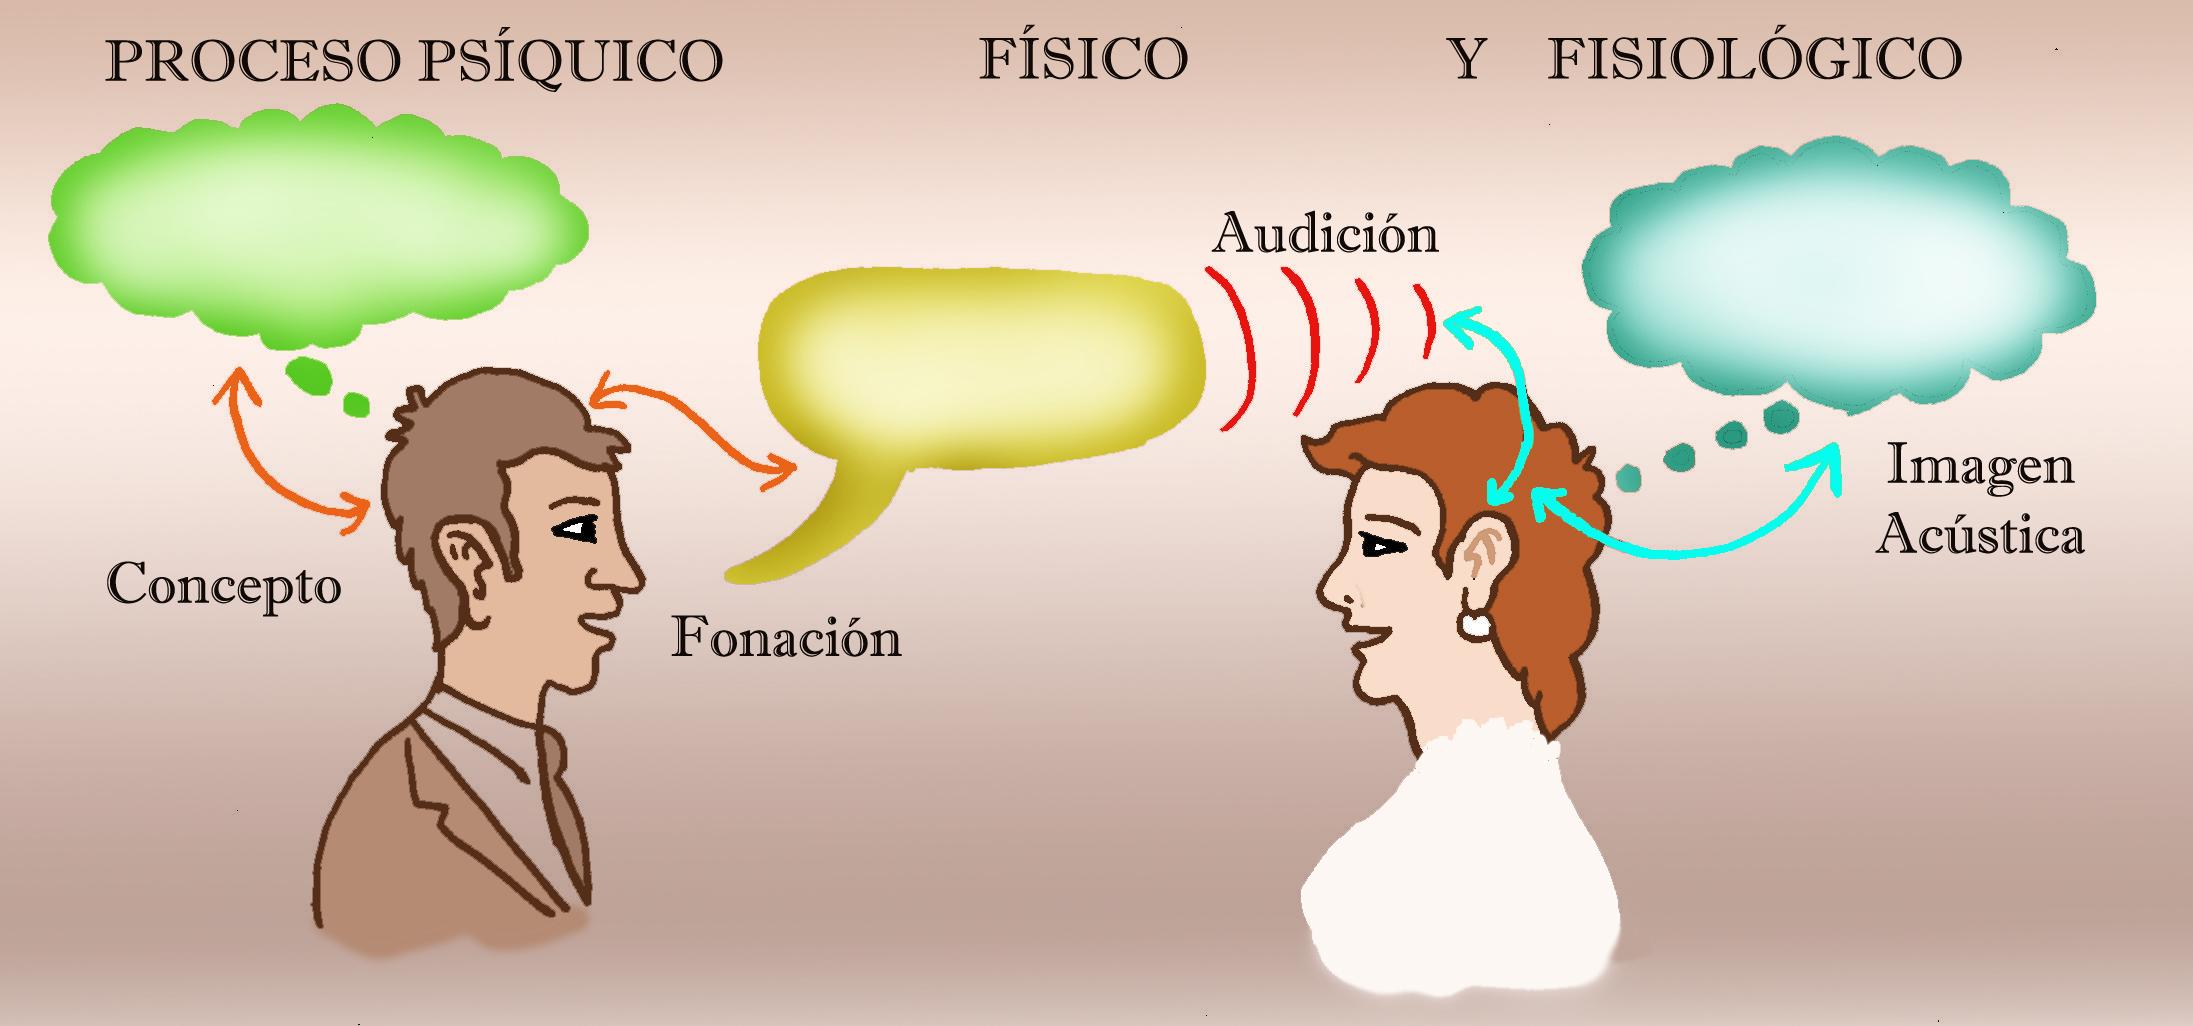 Circuito Del Habla : Archivo:proceso del habla.jpg wikipedia la enciclopedia libre